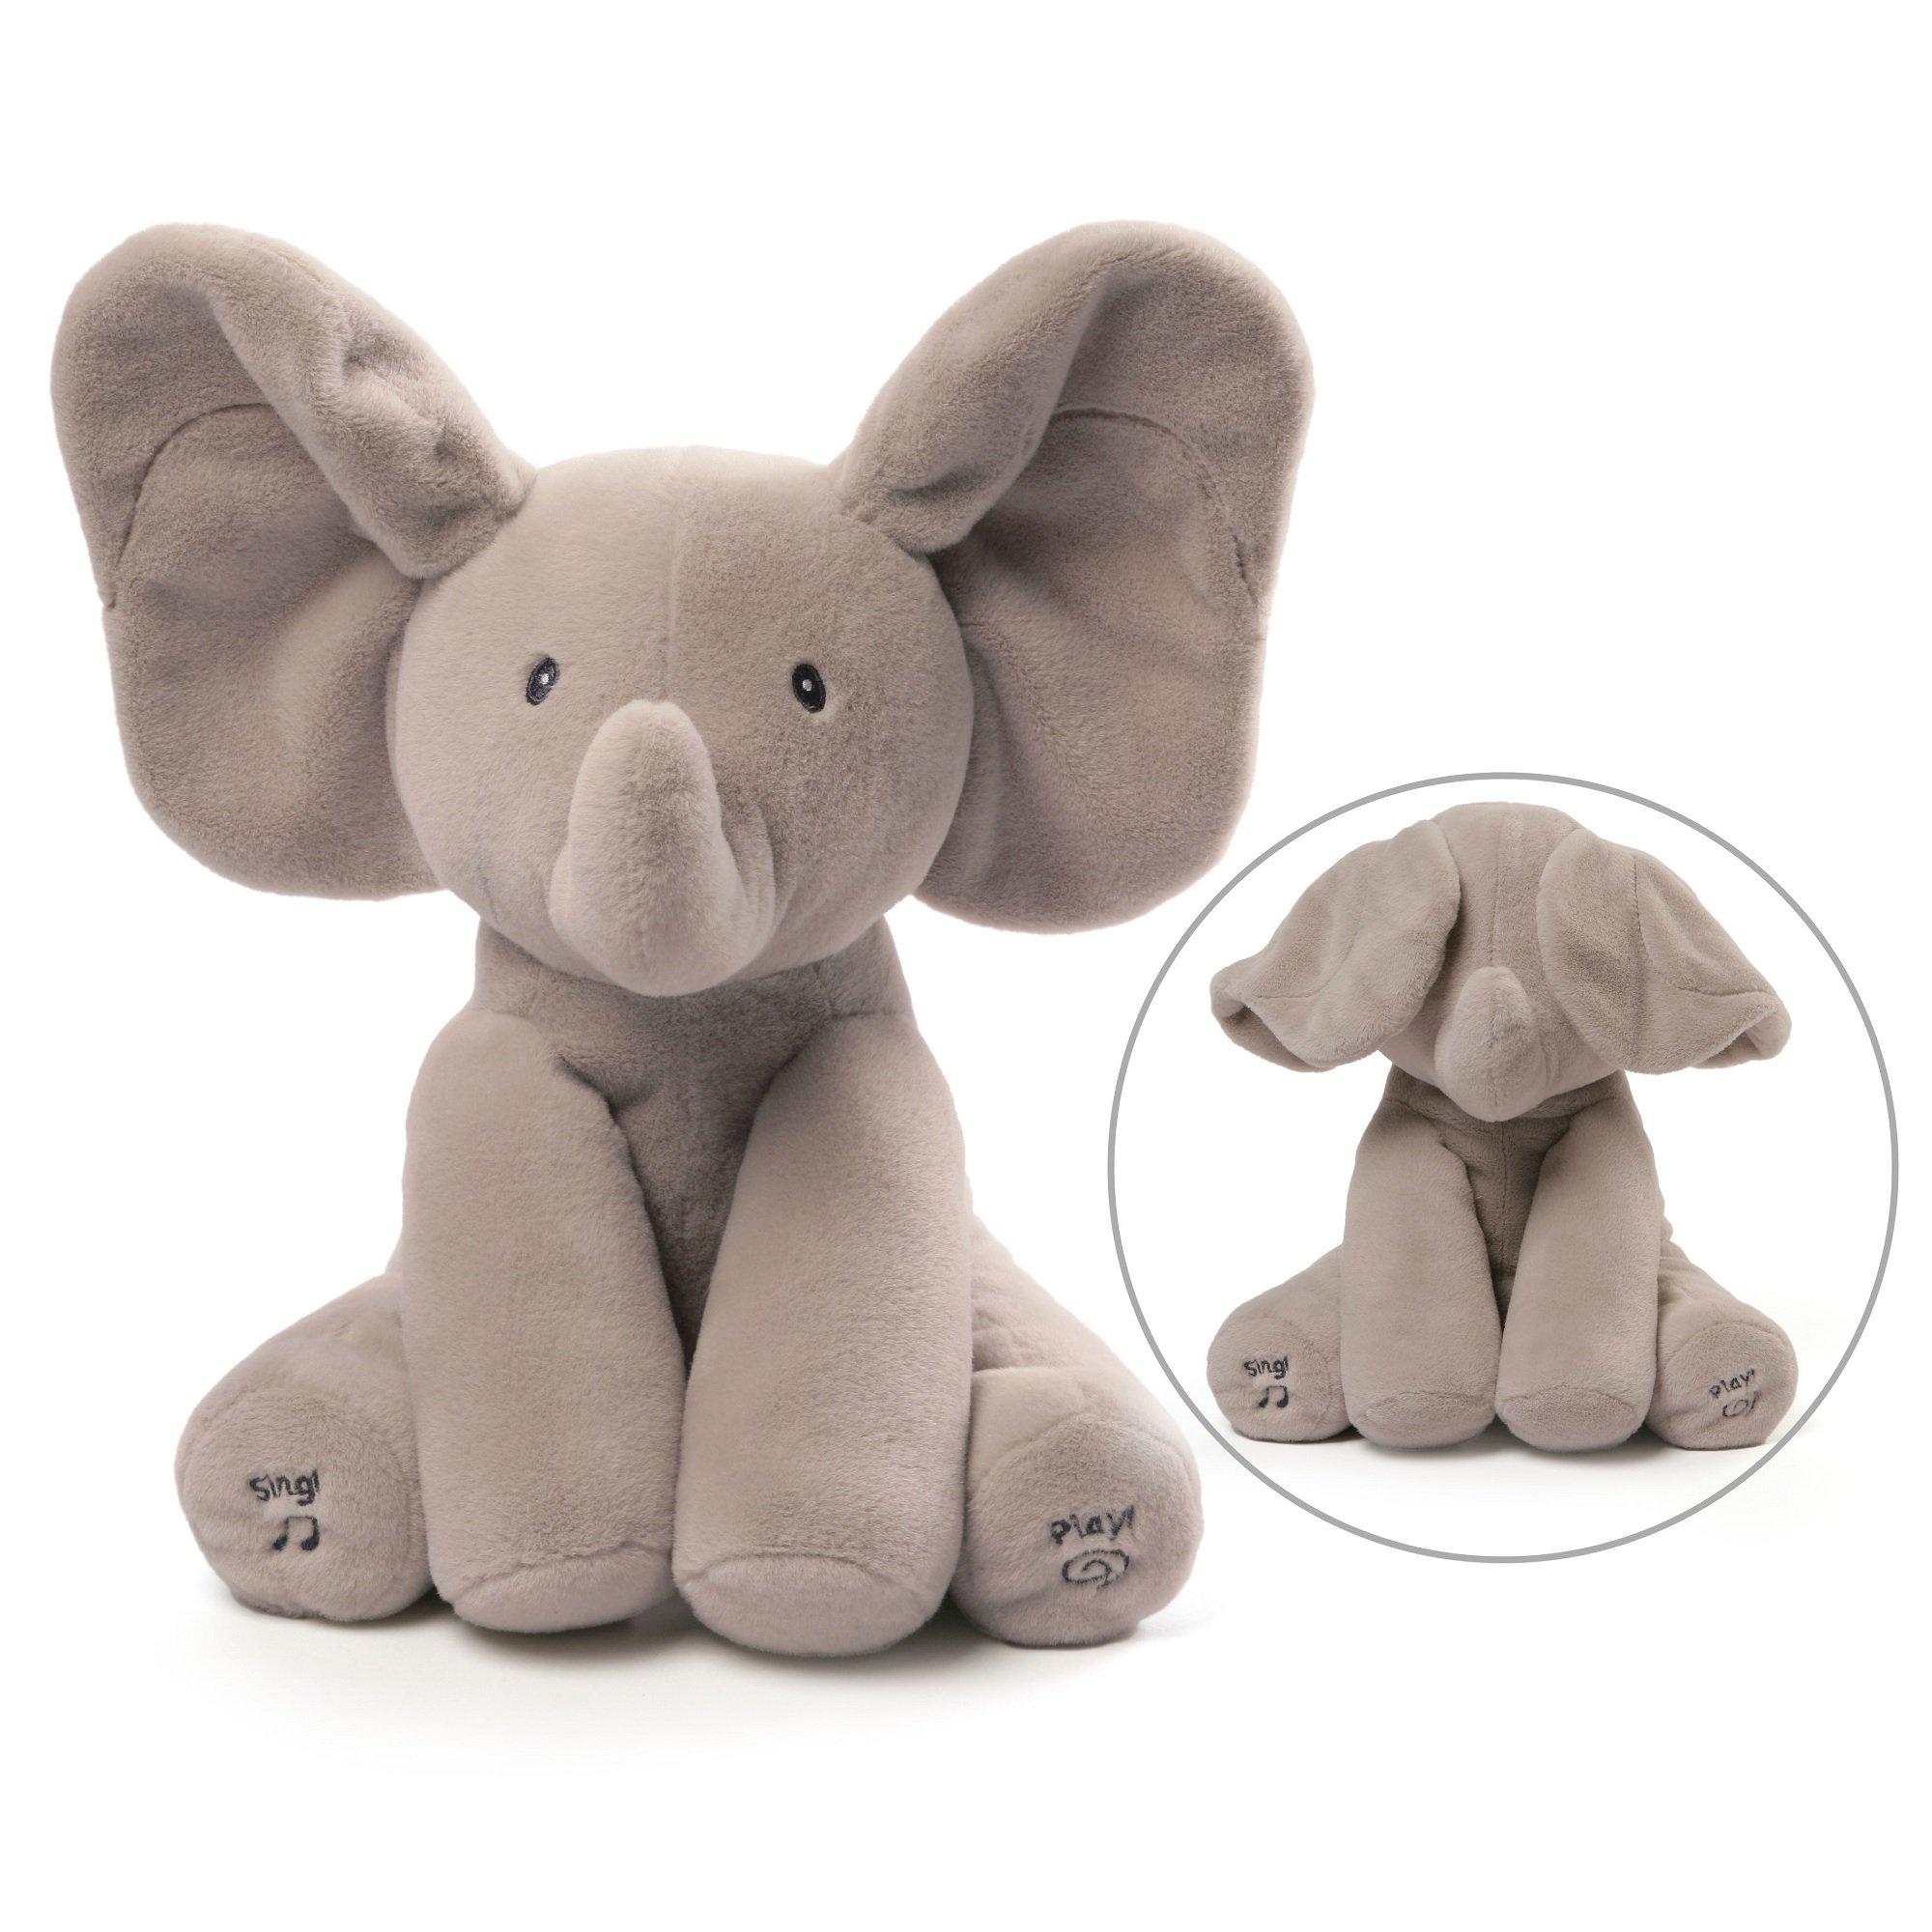 GUND Baby Animated Flappy The Elephant Stuffed Animal Plush, Gray, 12 by GUND